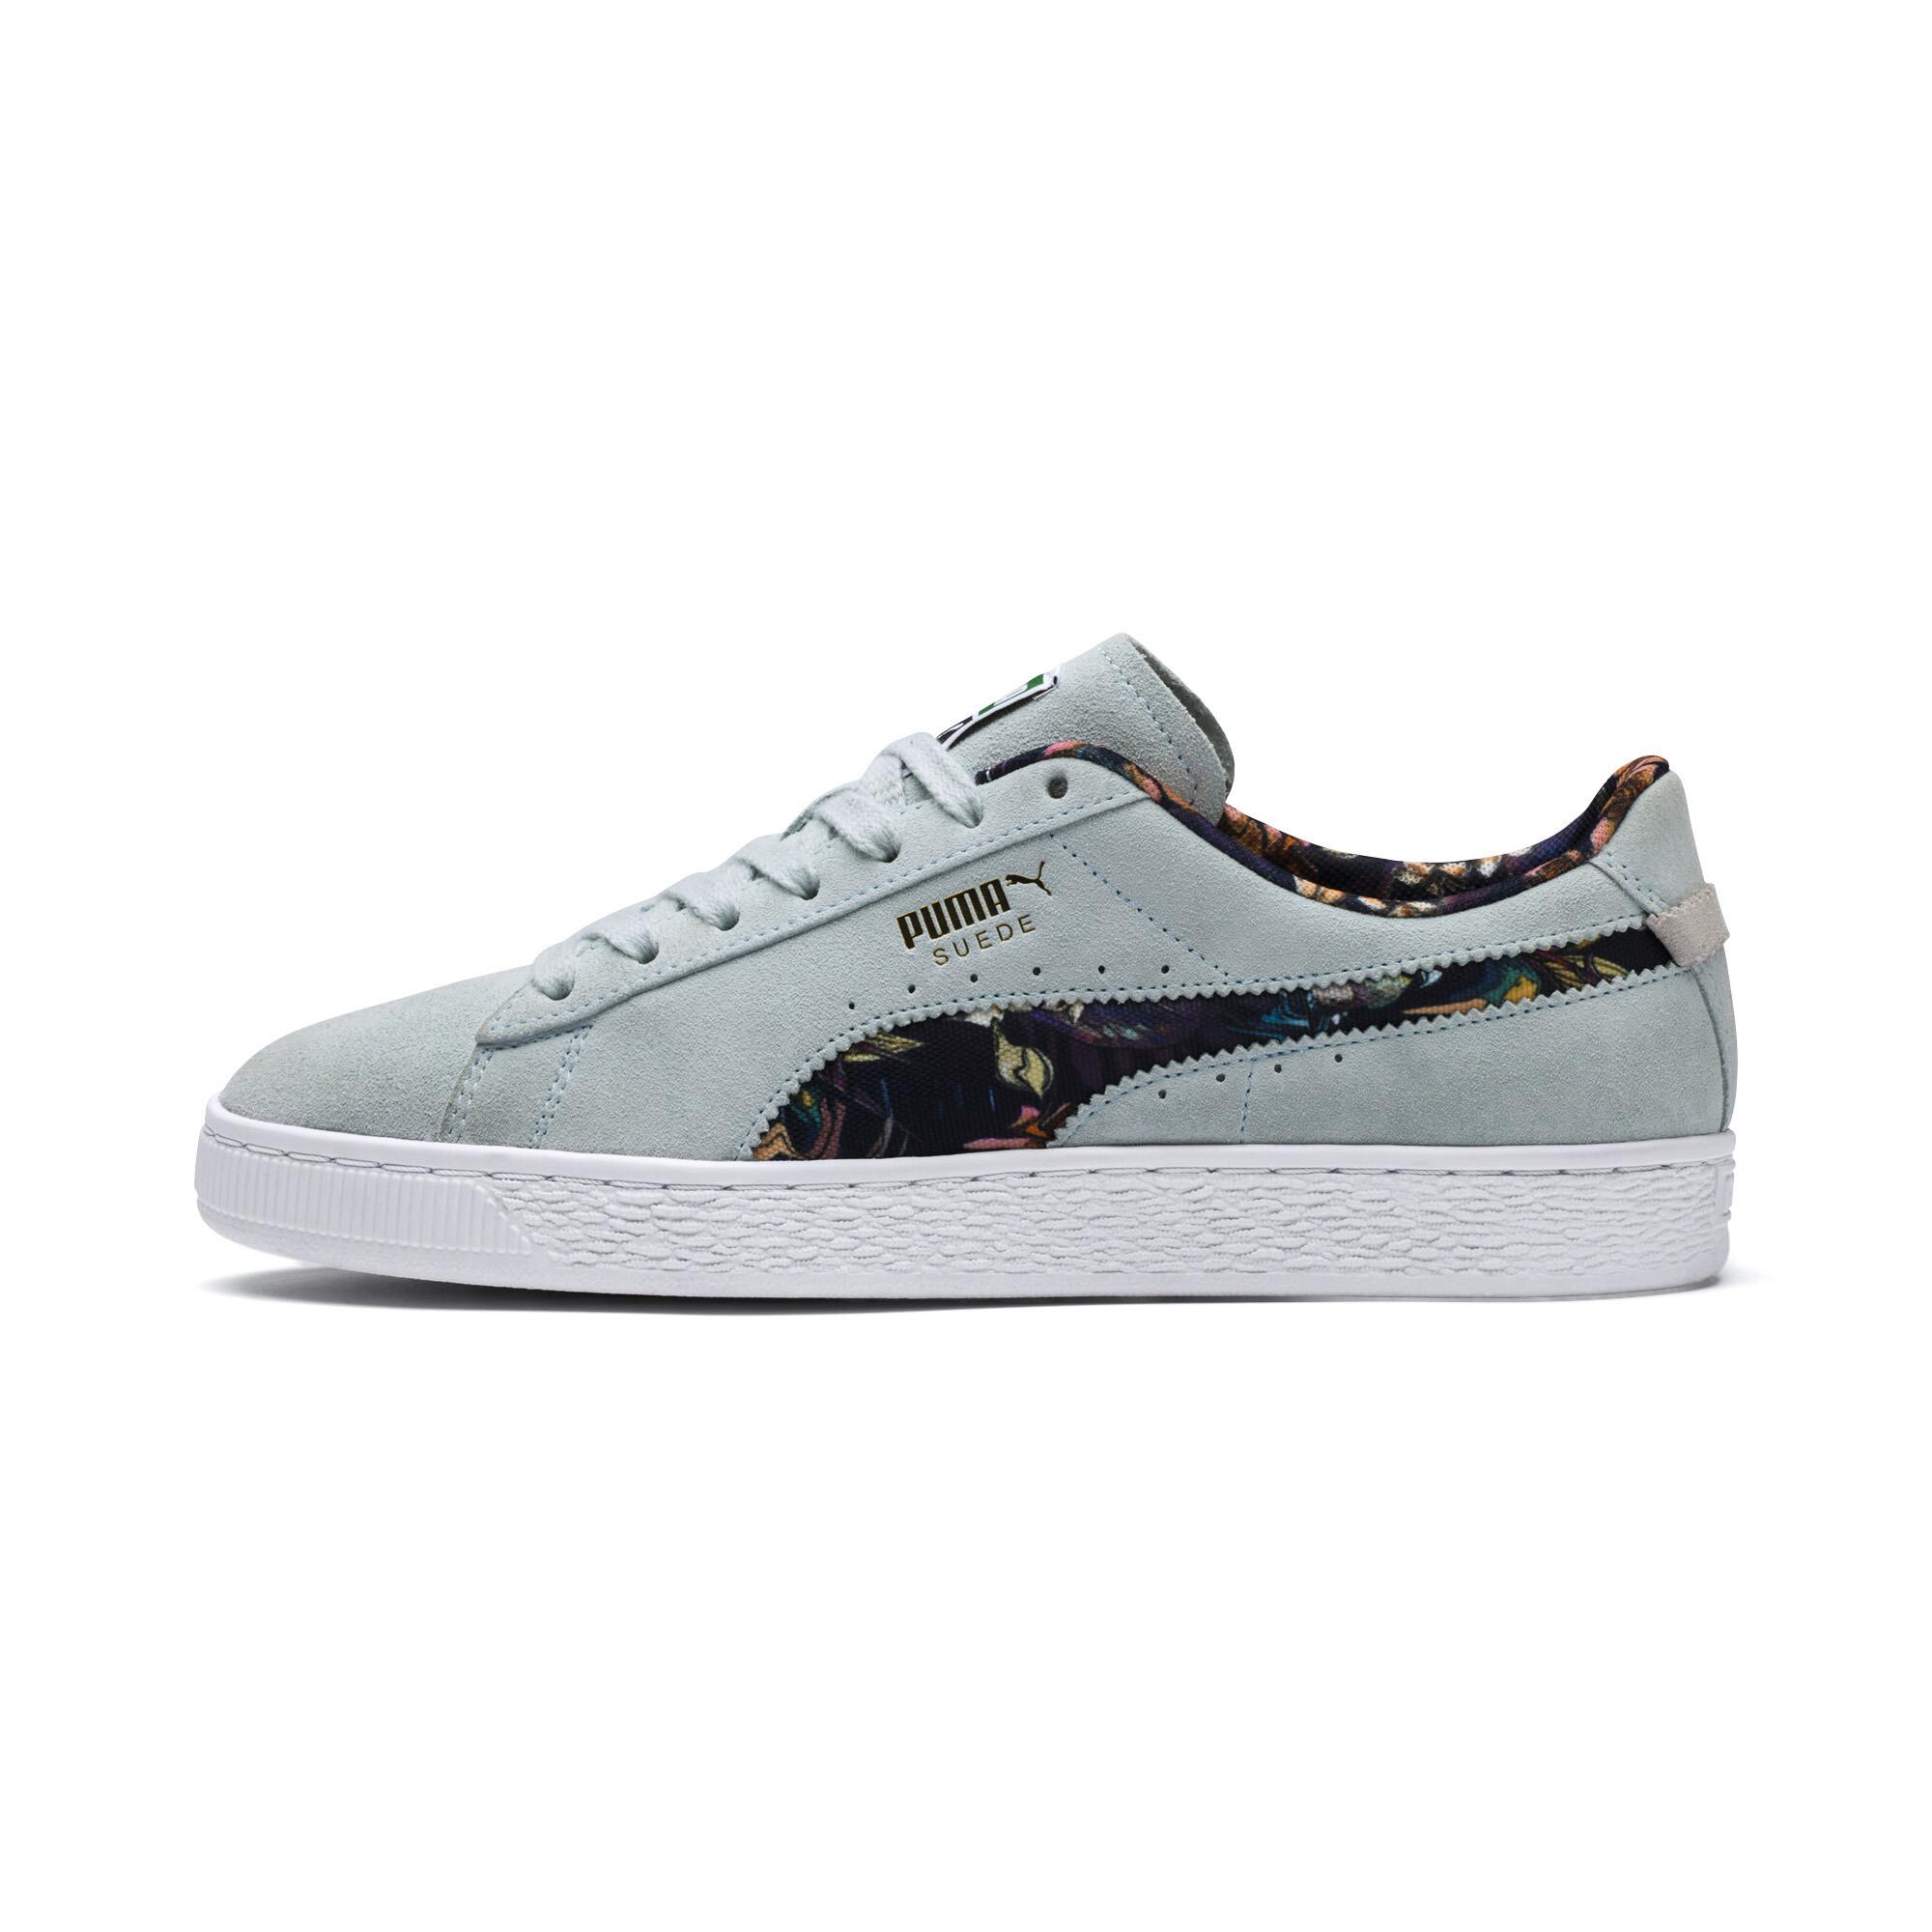 Image Puma Suede Secret Garden Sneakers #1